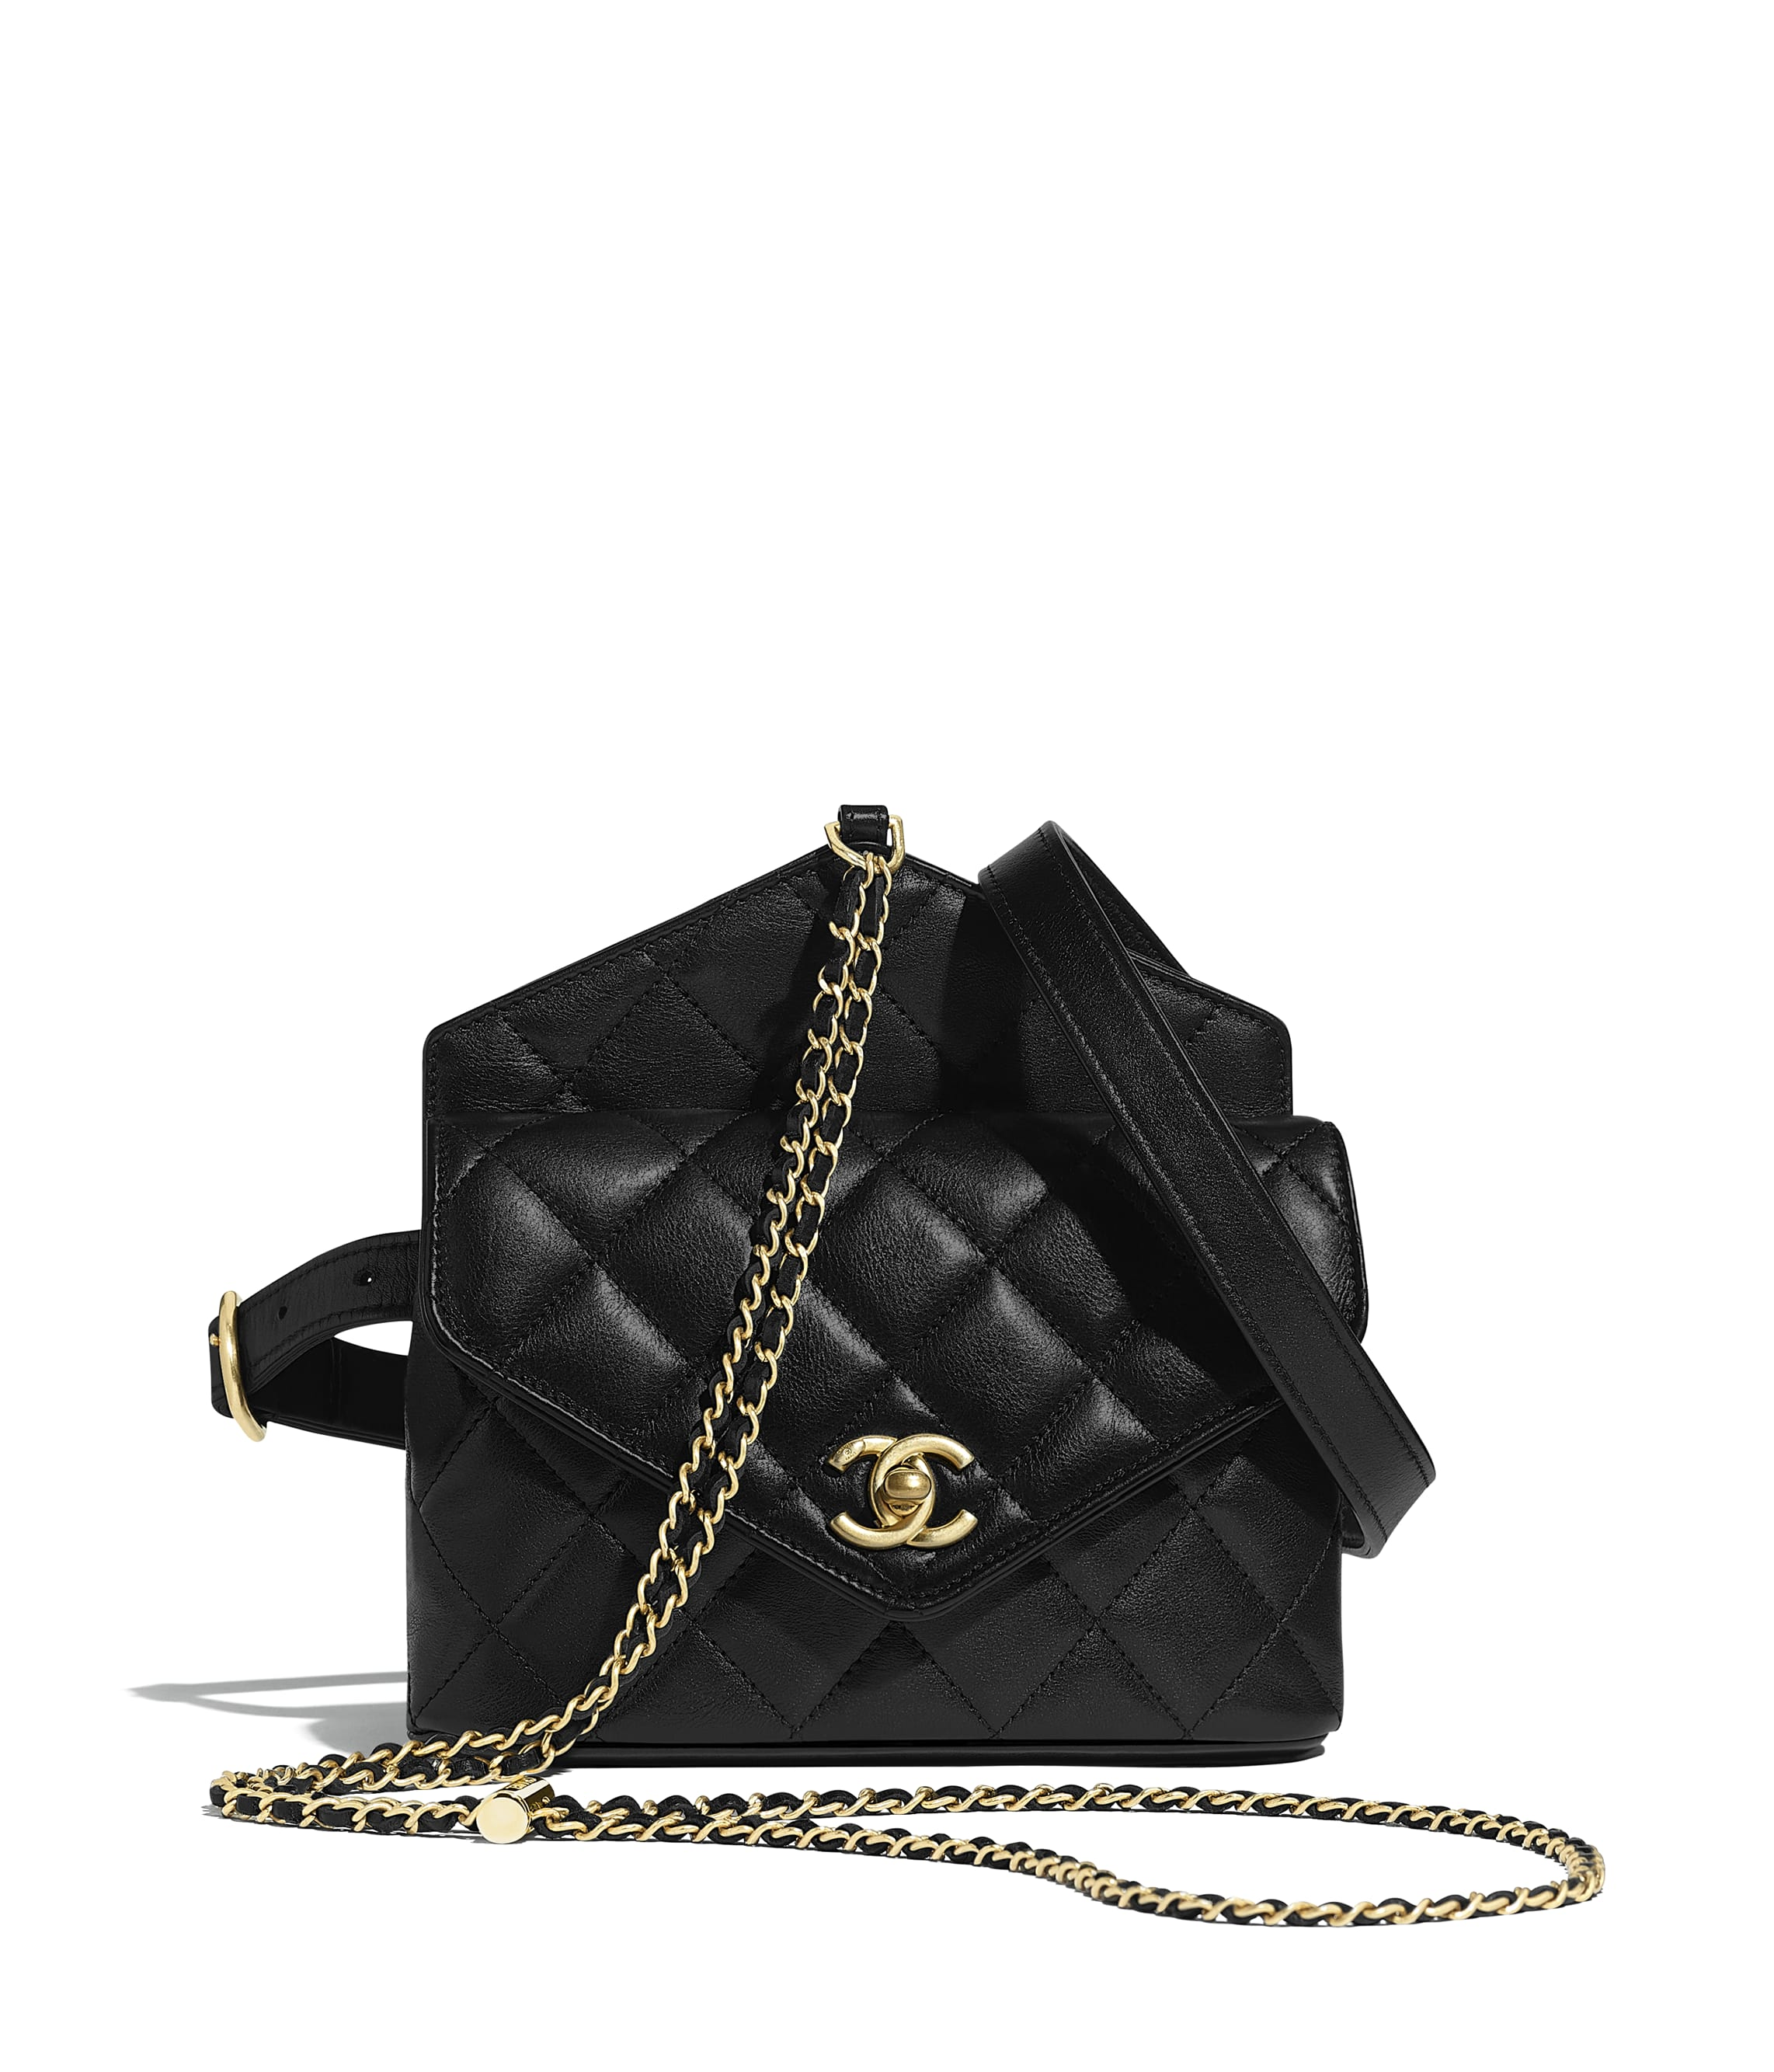 302663aebe Waist Bag, calfskin & gold-tone metal, black - CHANEL